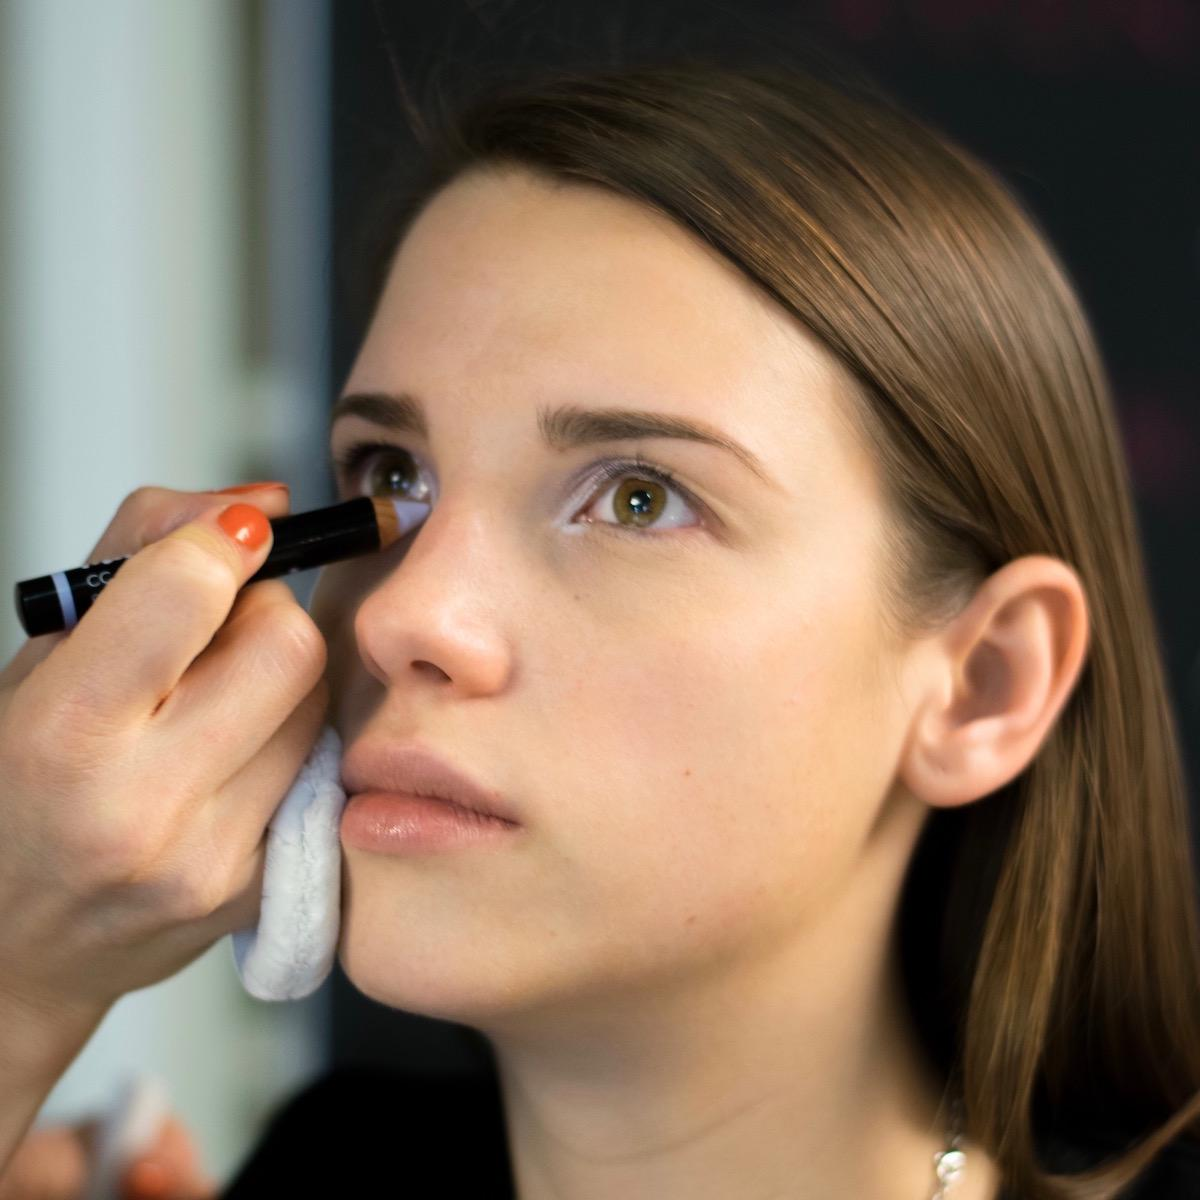 Avon mark vijolični korektor beautyfullblog ličenje makeup